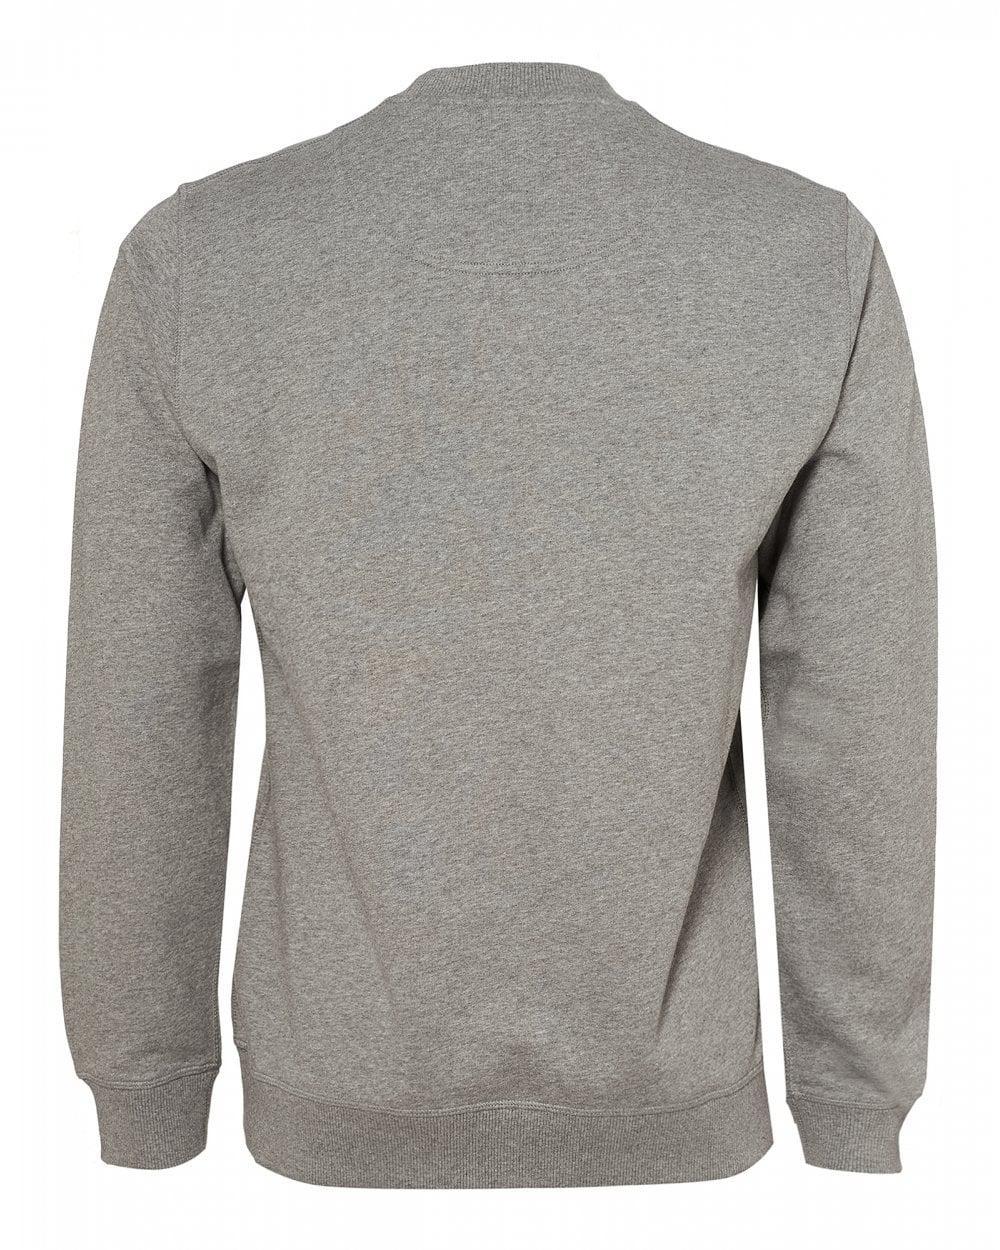 3c96547b9 KENZO Eye Logo Sweatshirt, Regular Fit Dove Grey Sweat in Gray for Men -  Lyst